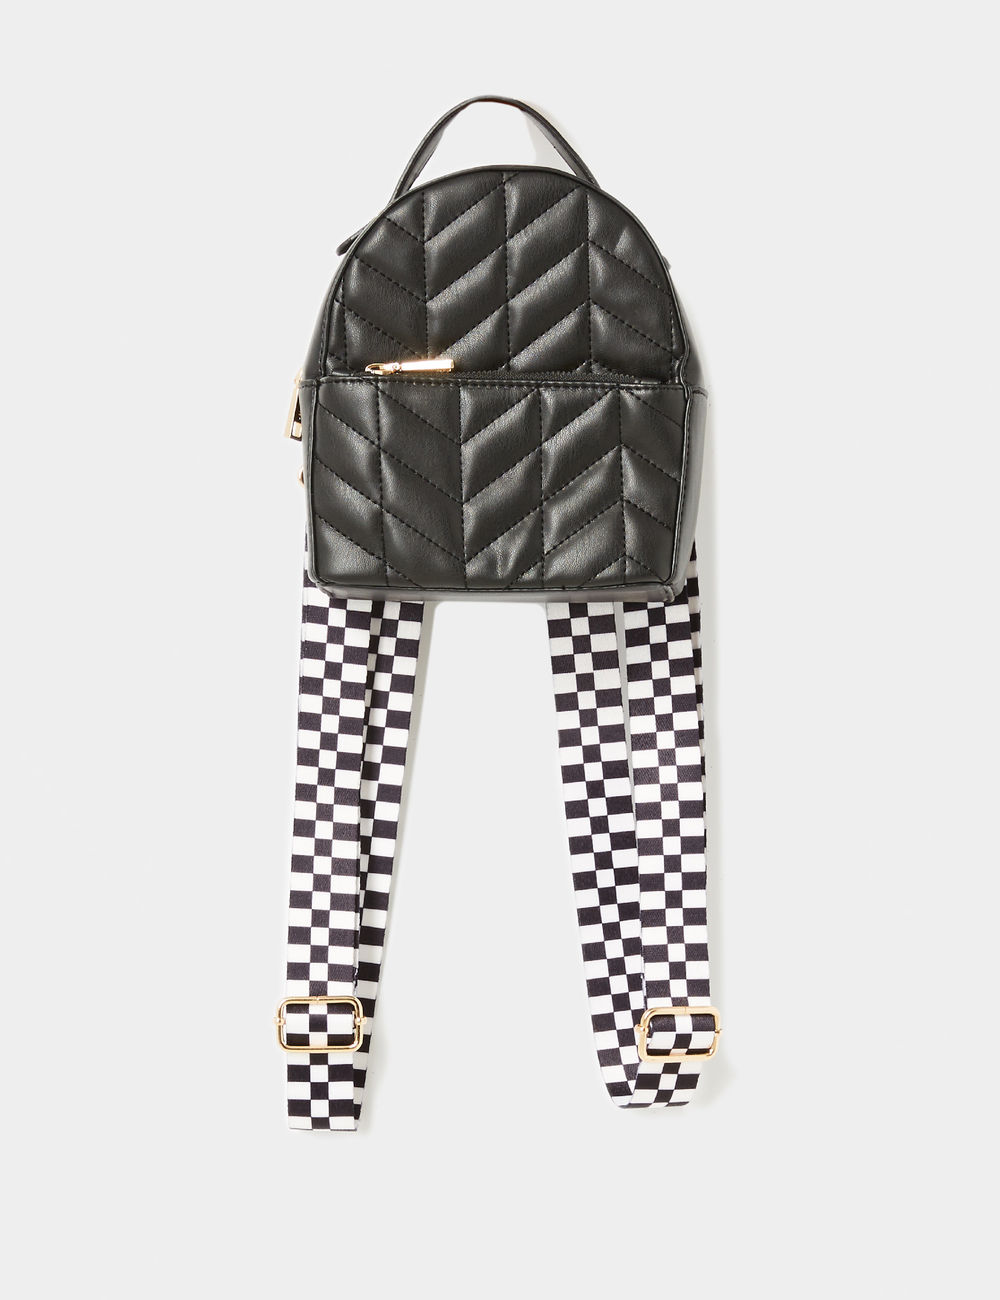 petit sac à dos noir Jennyfer prix 17,99 €